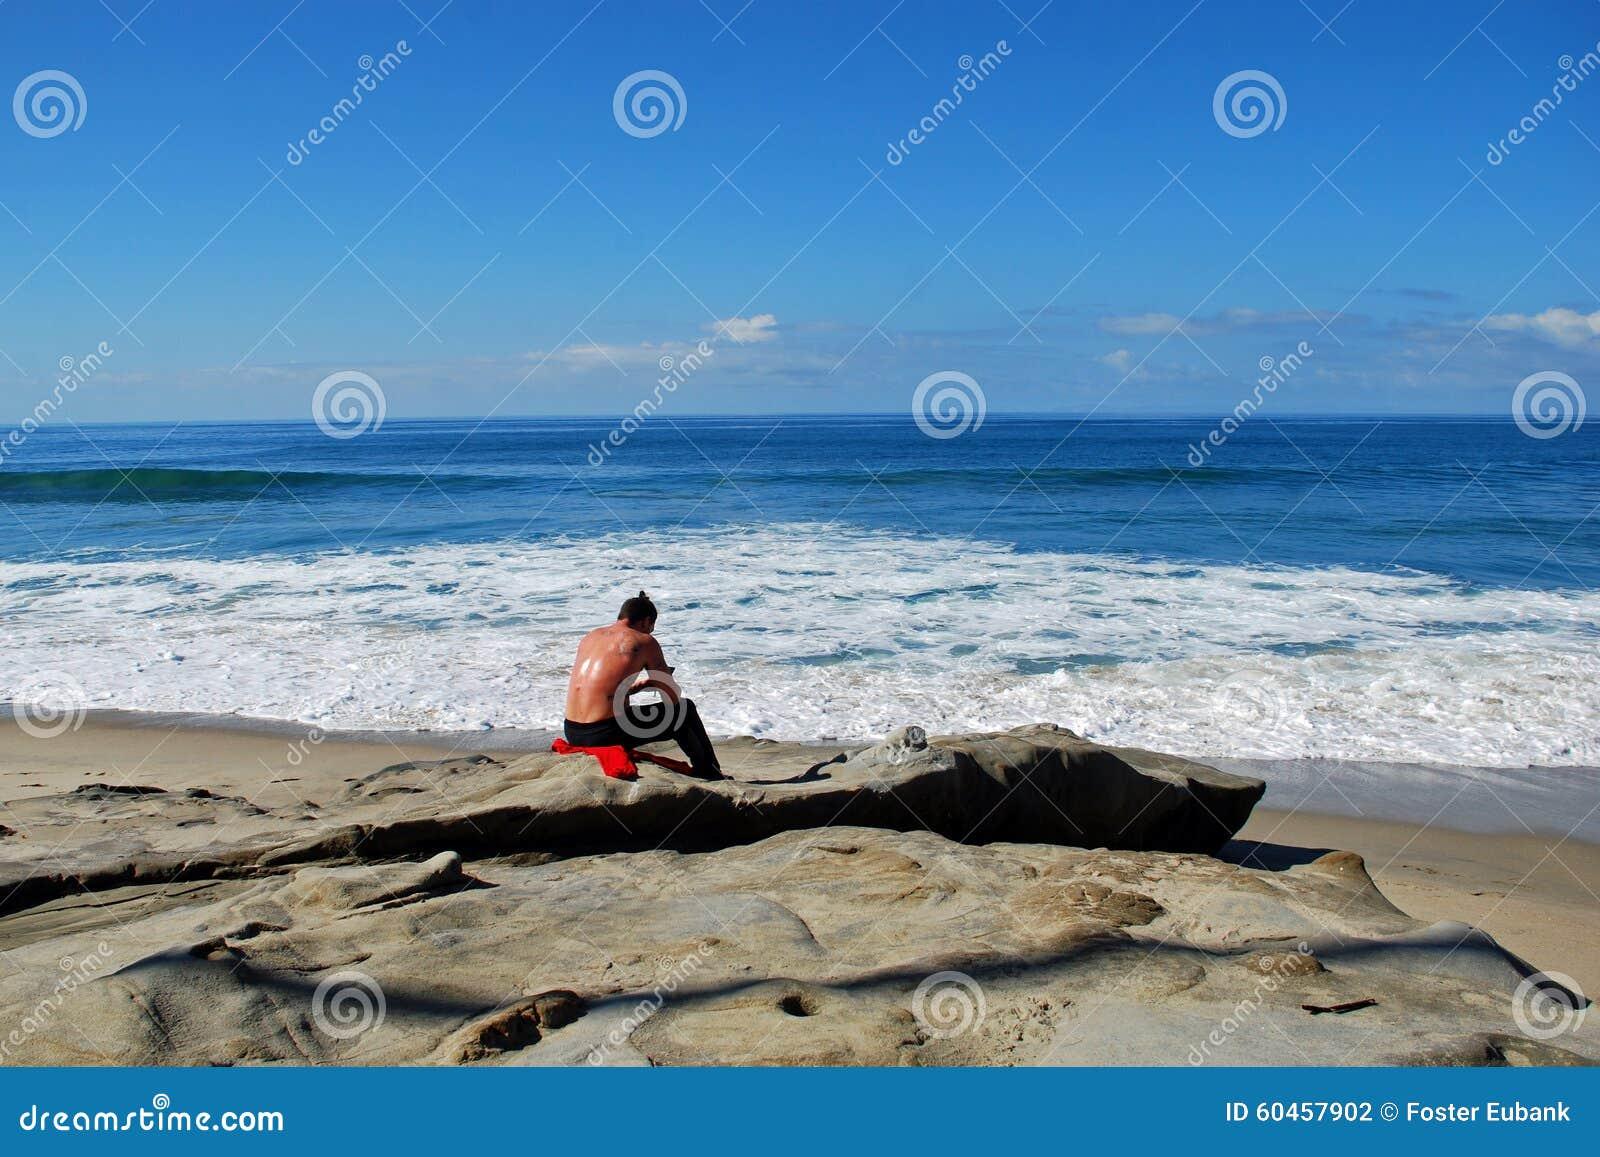 single men in laguna beach Looking for singles in laguna beach dating in laguna beach dating site for single women in laguna beach dating site for single men in laguna beach.